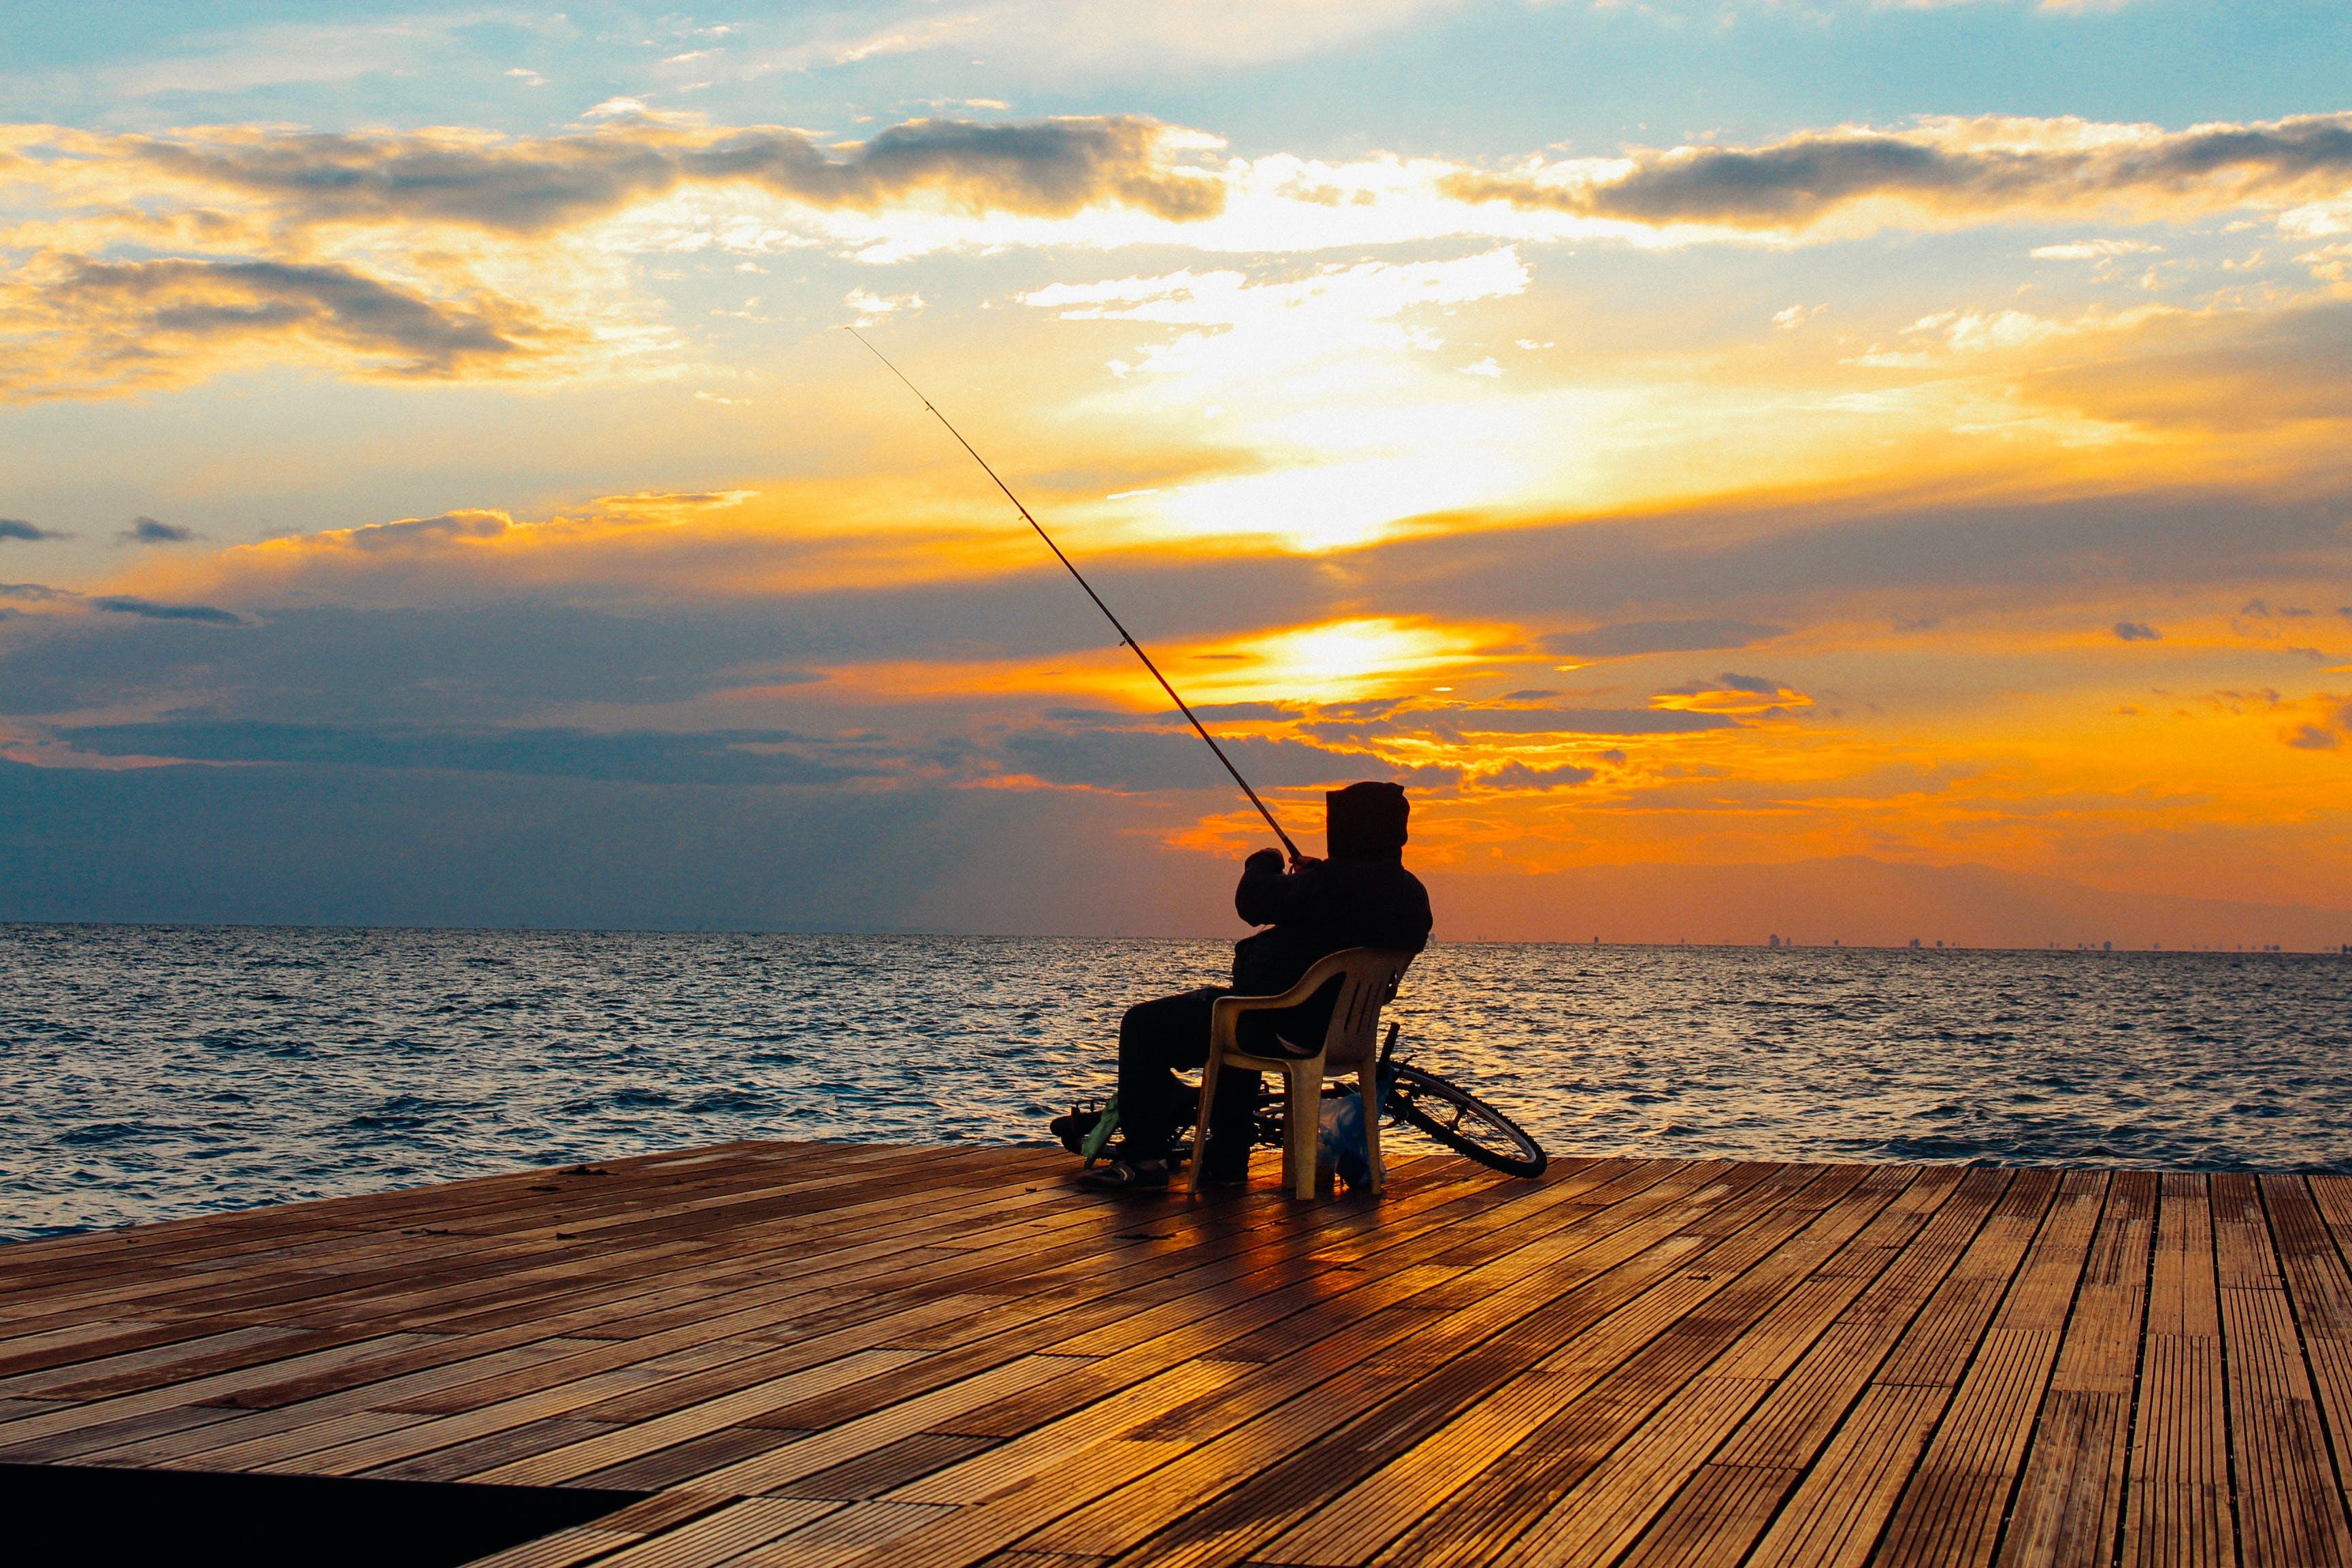 Gratis arkivbilde med avslapping, bukt, daggry, fiske